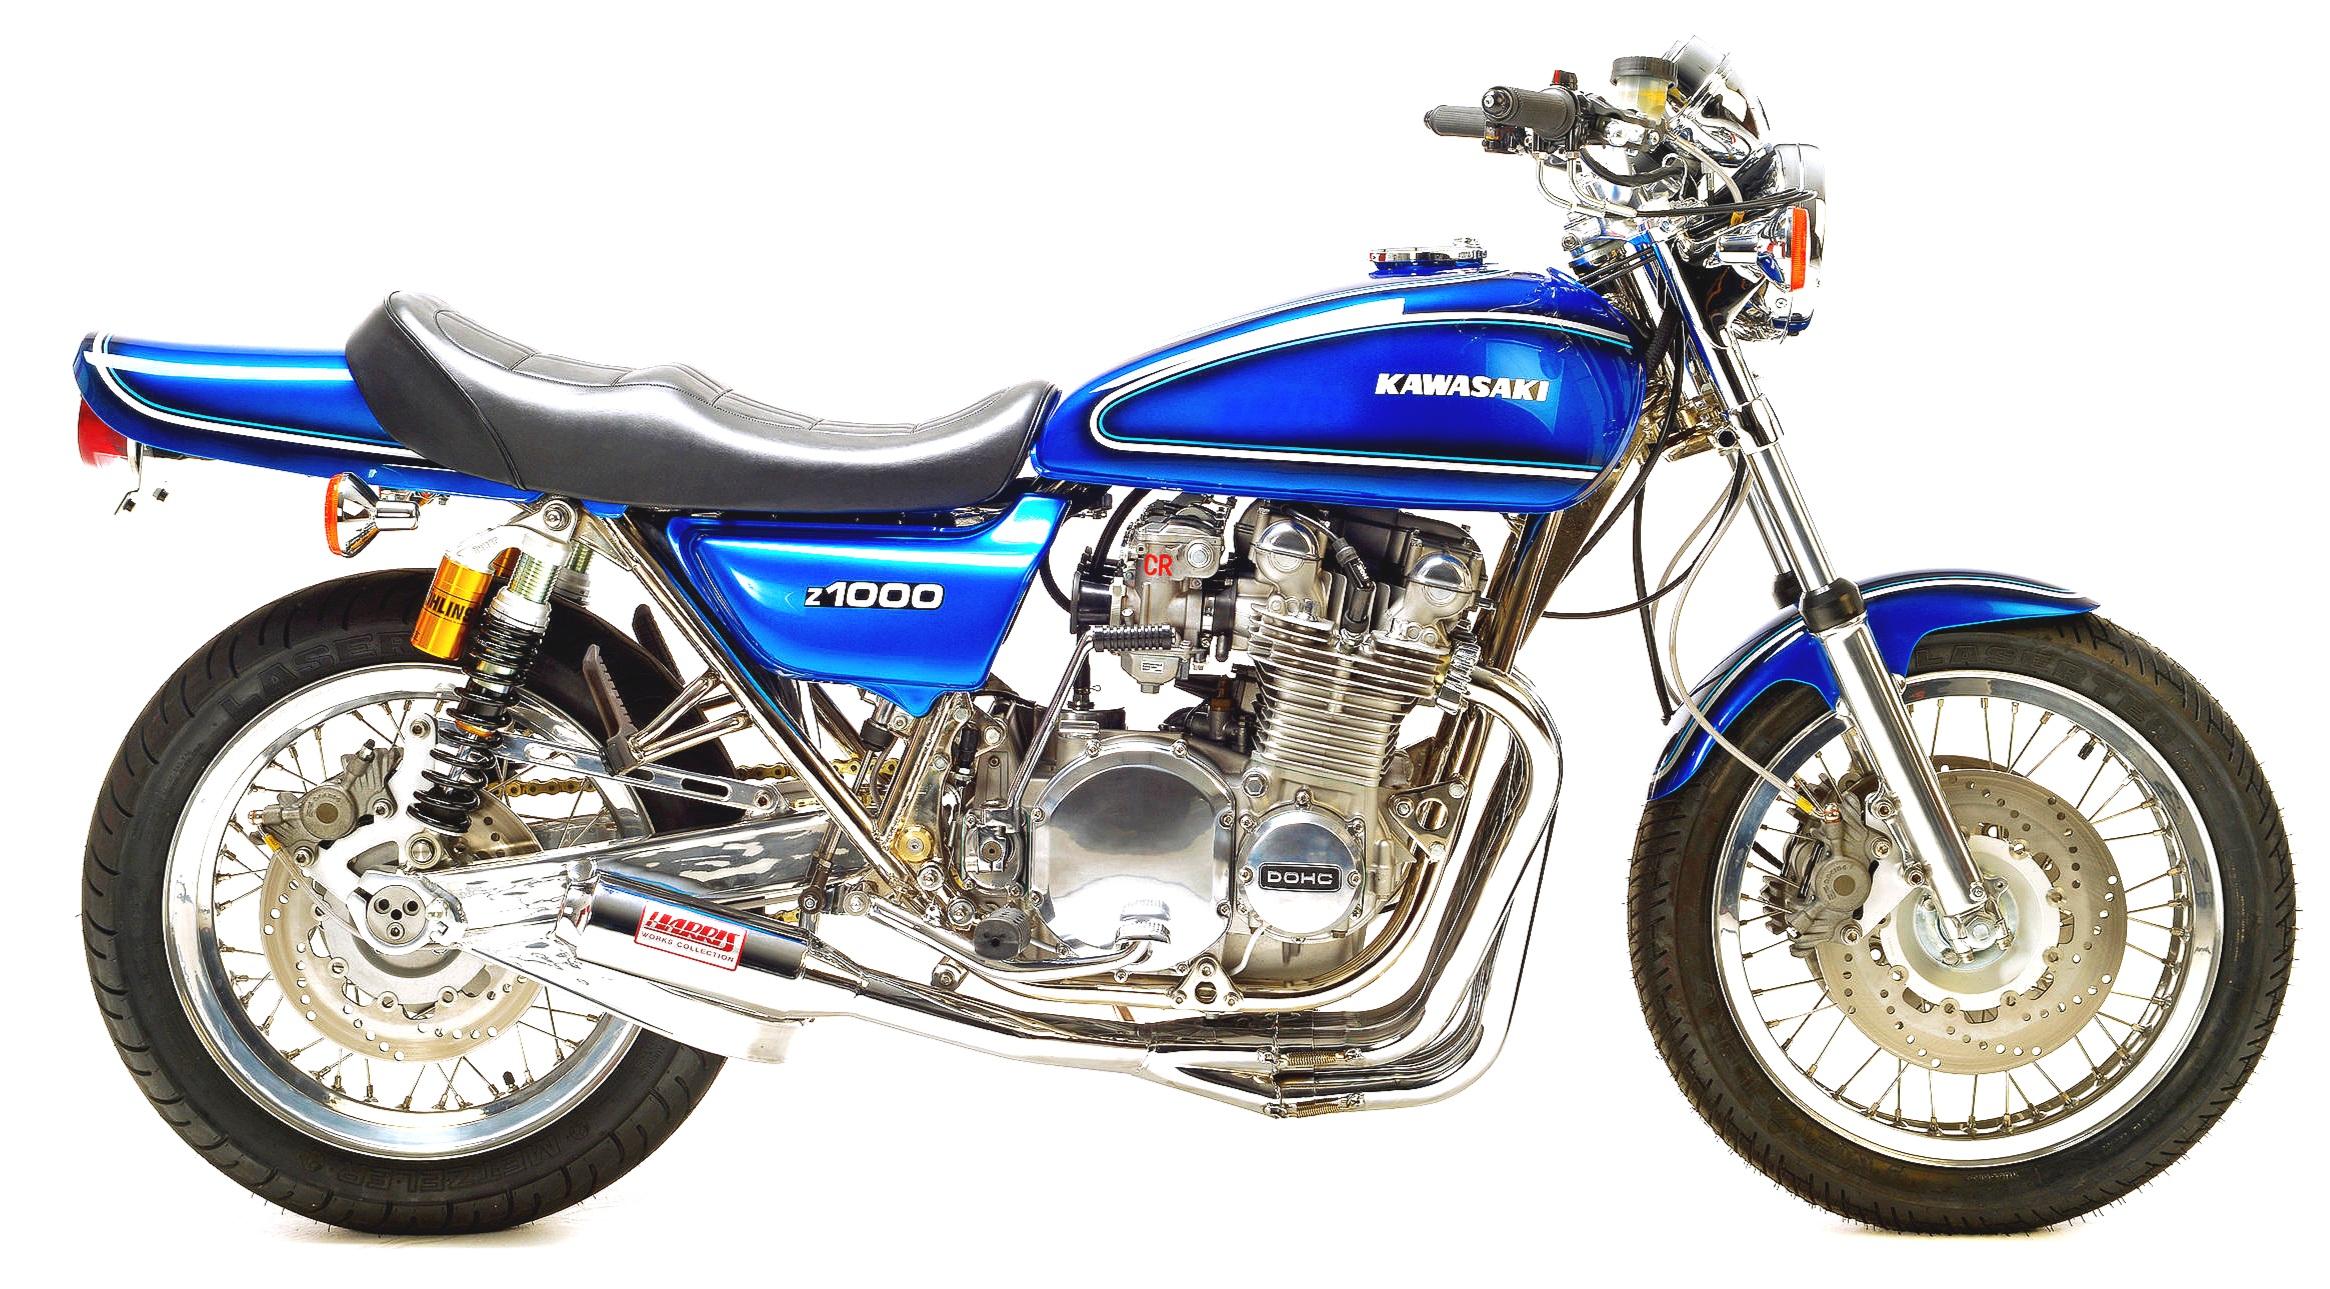 Z1000A1 Special